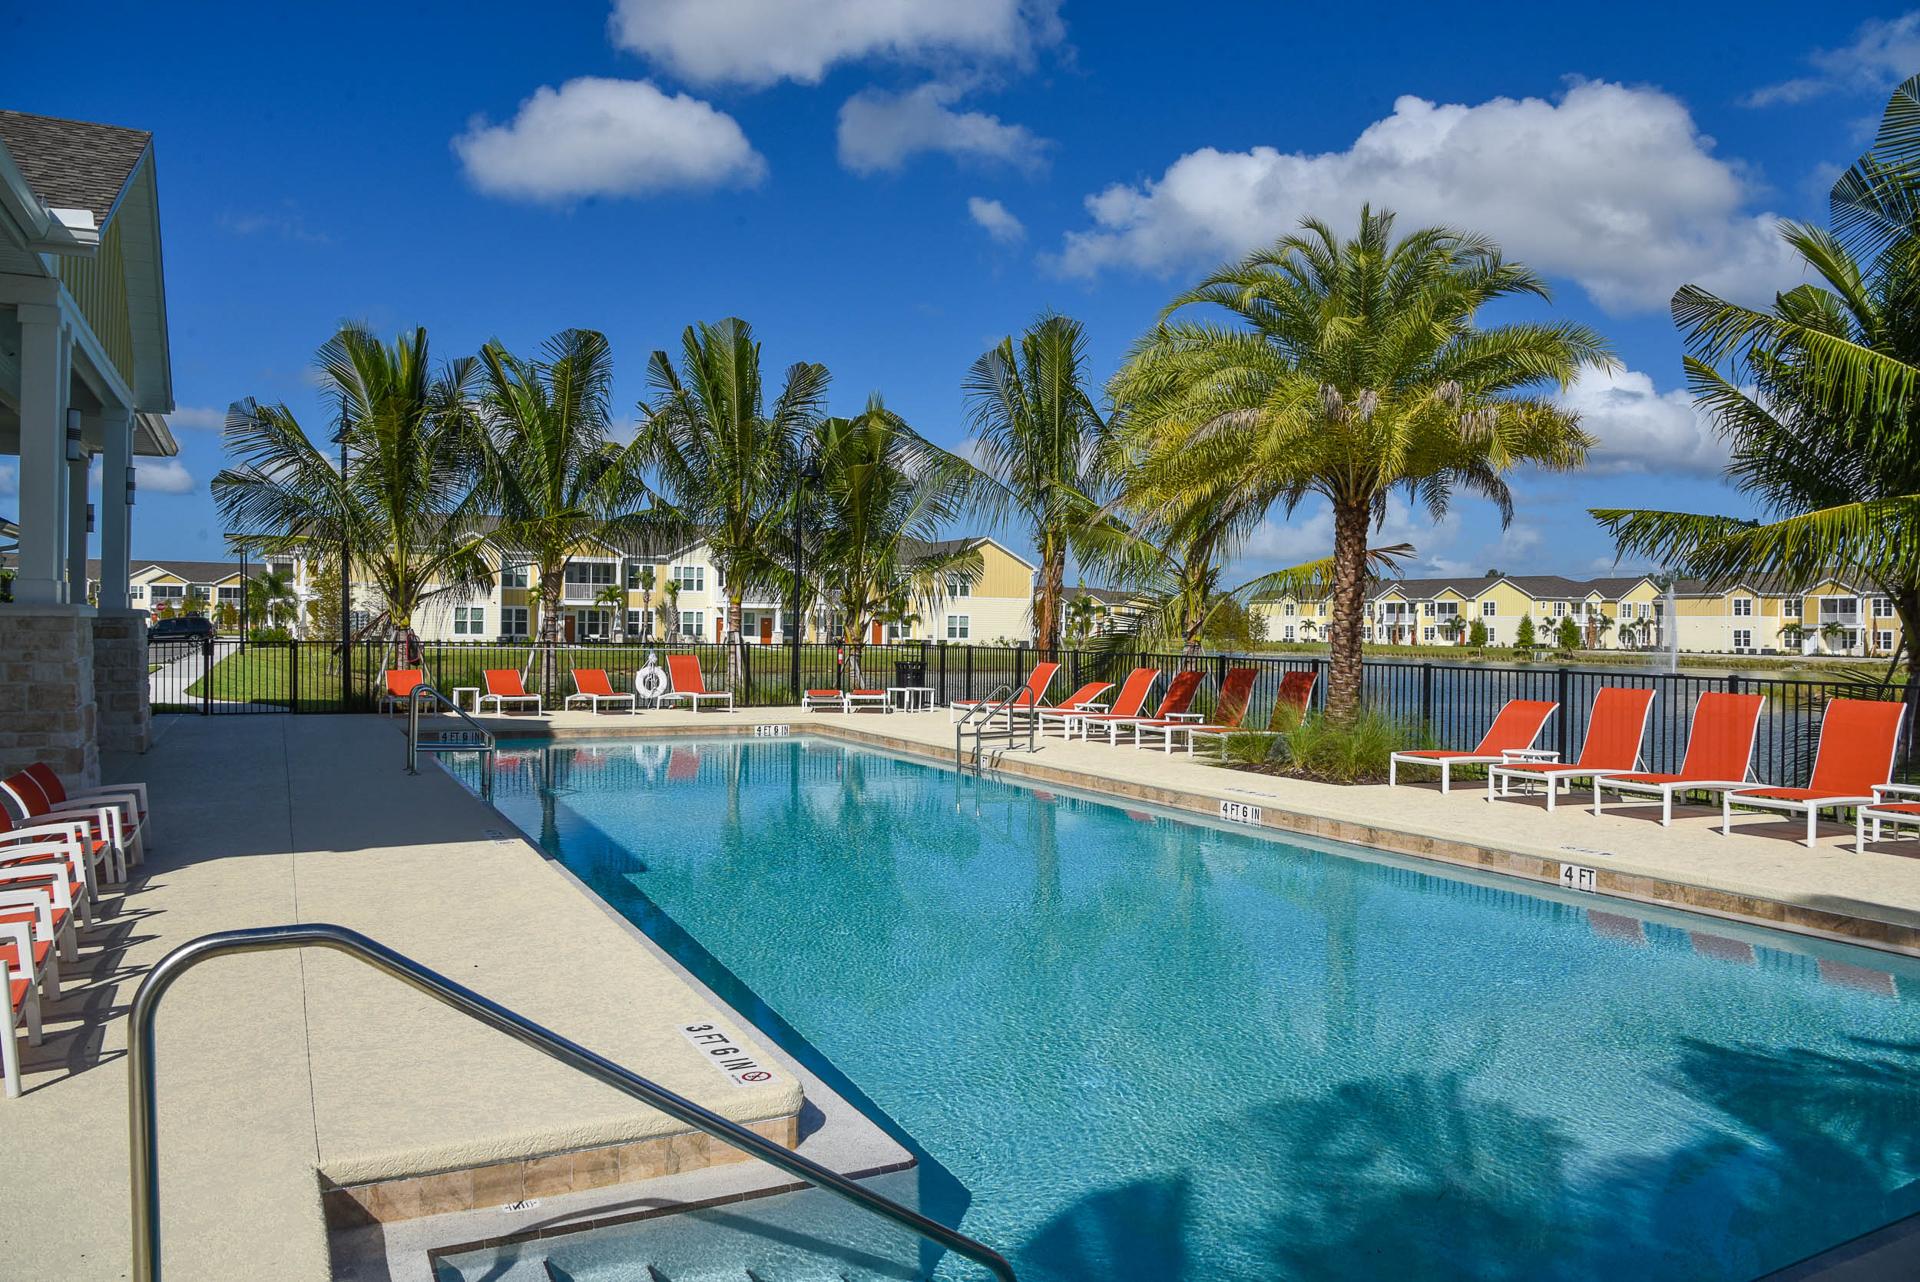 Springs at Six Mile Cypress resort style pool